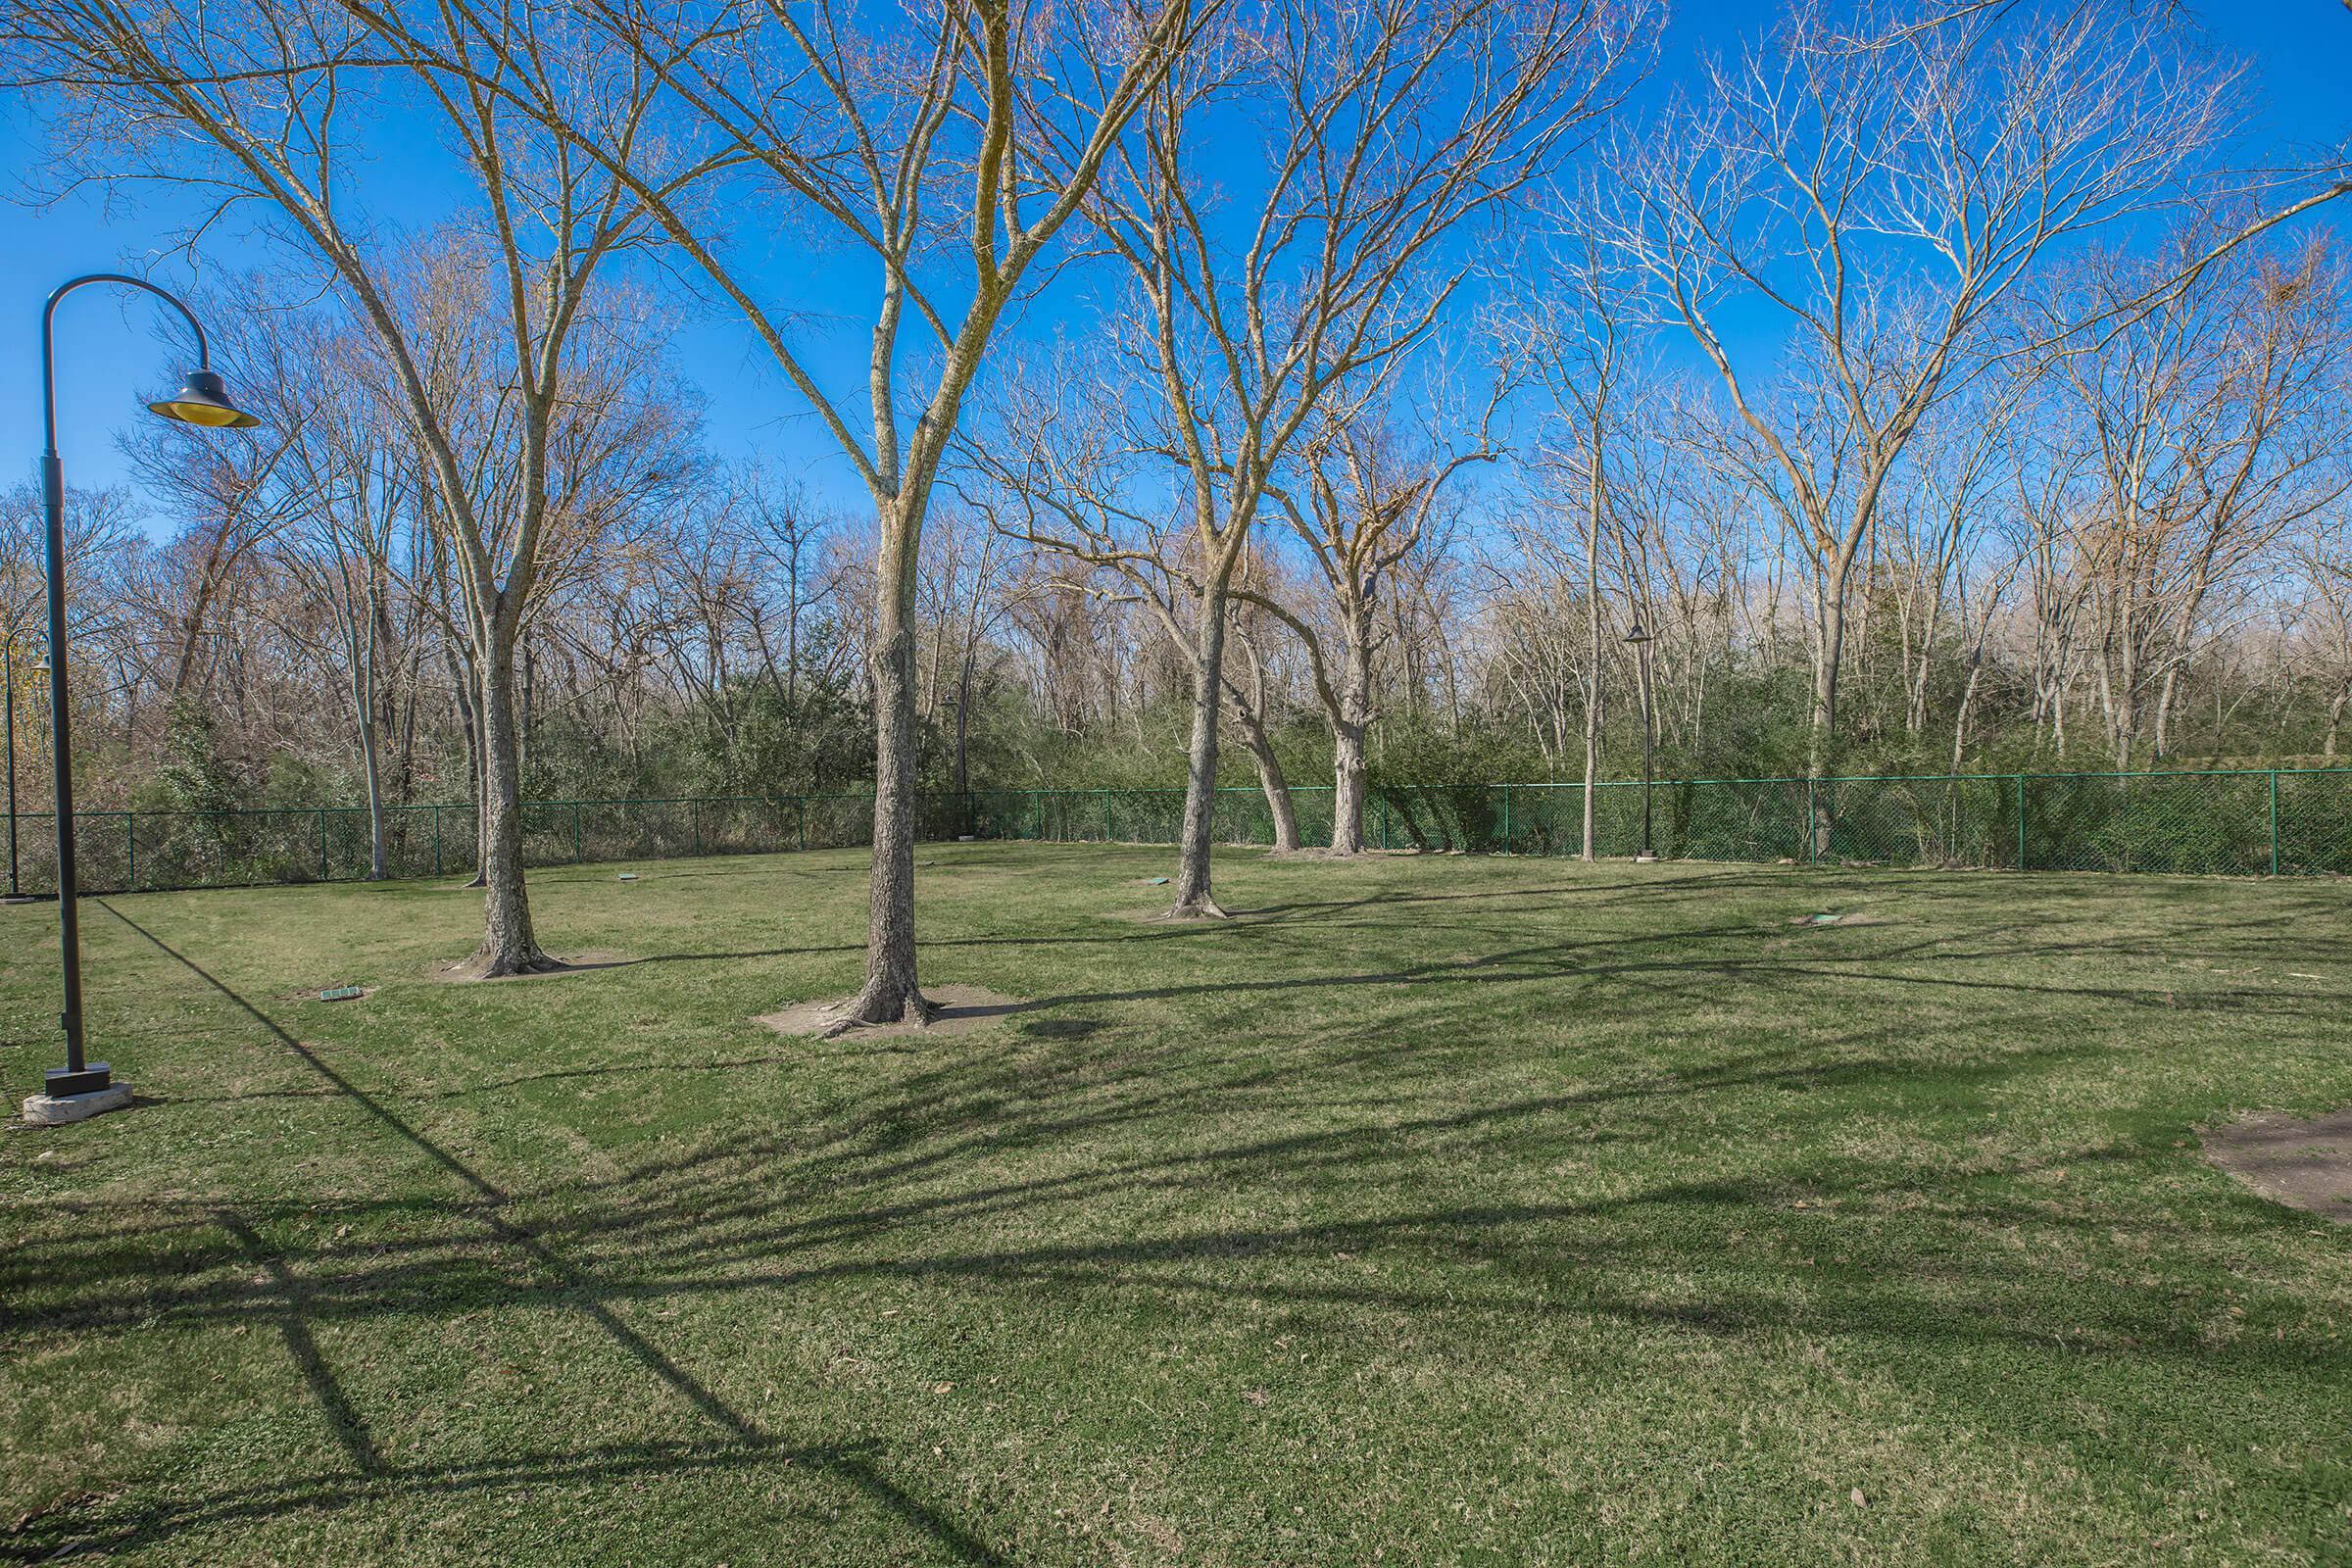 a tree in a grassy field